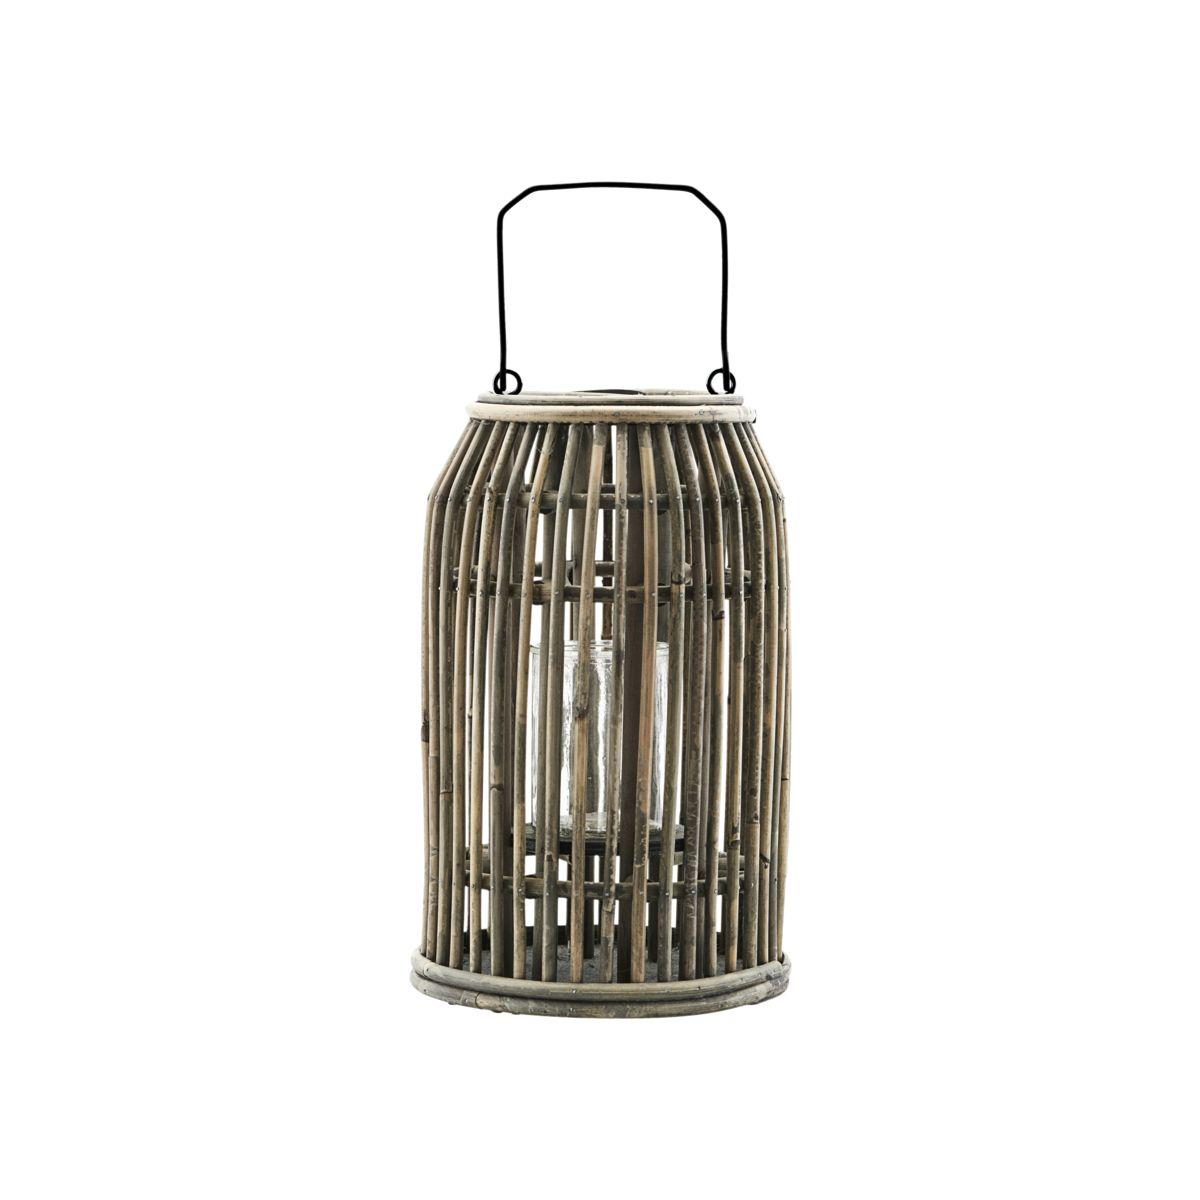 House Doctor - Ova Lantern - Small (Ln0091)